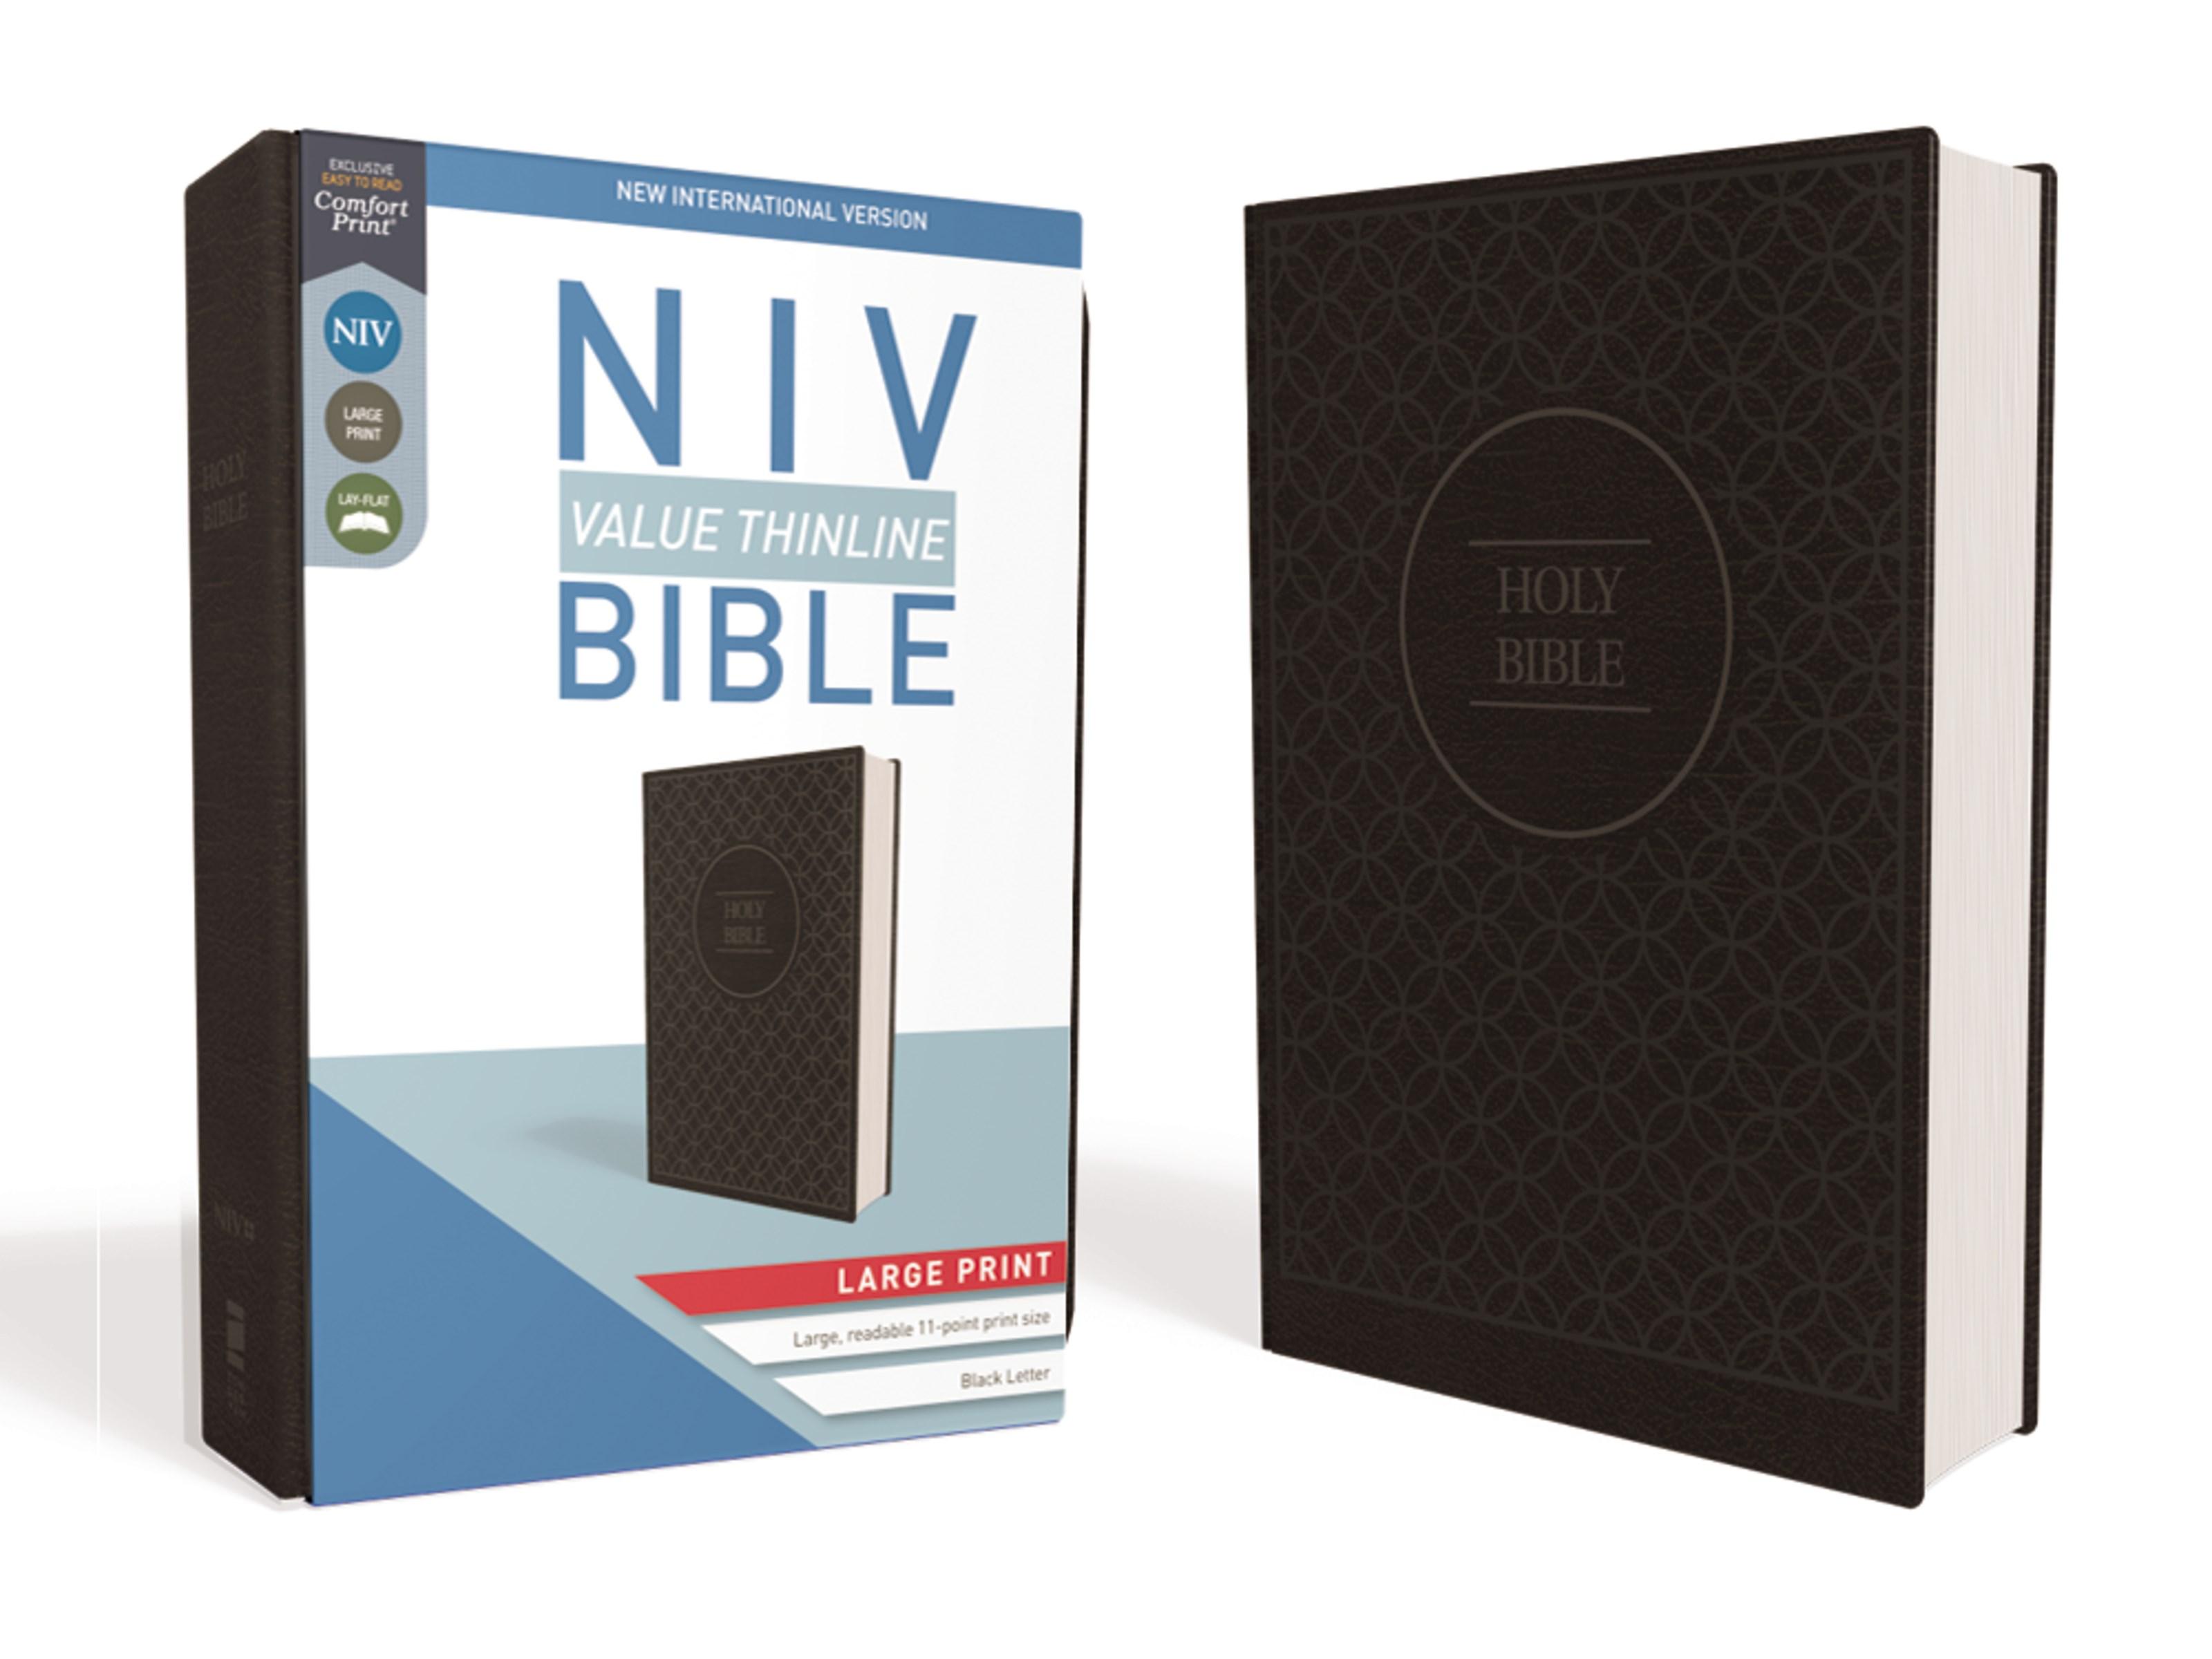 NIV Value Thinline Bible/Large Print (Comfort Print)-Charcoal/Black Leathersoft